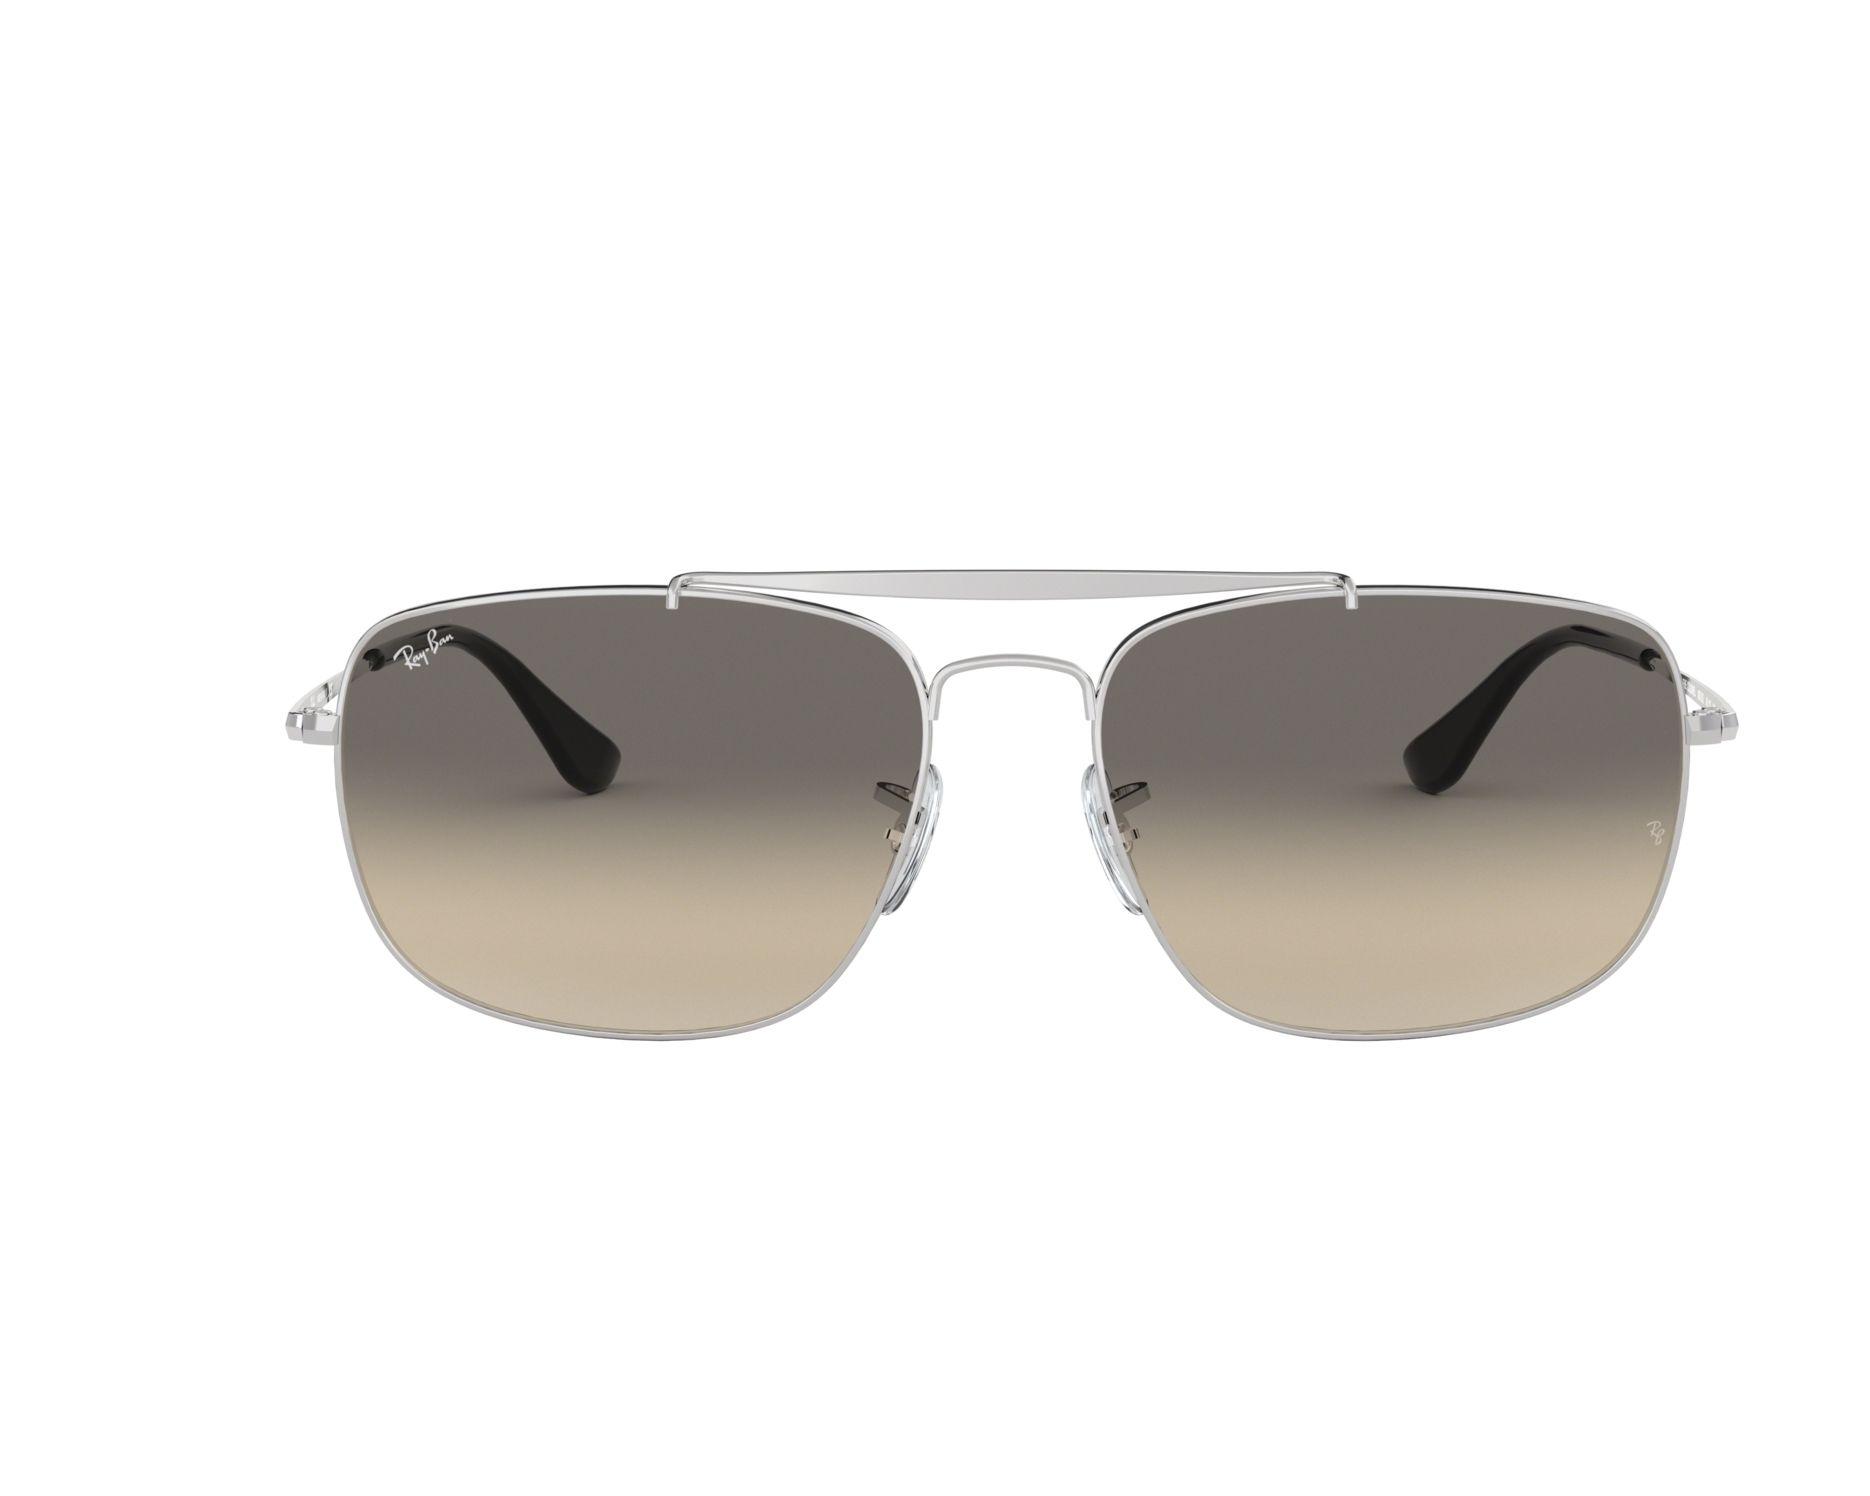 338b363a65c Sunglasses Ray-Ban RB-3560 003 32 58-17 Silver 360 degree